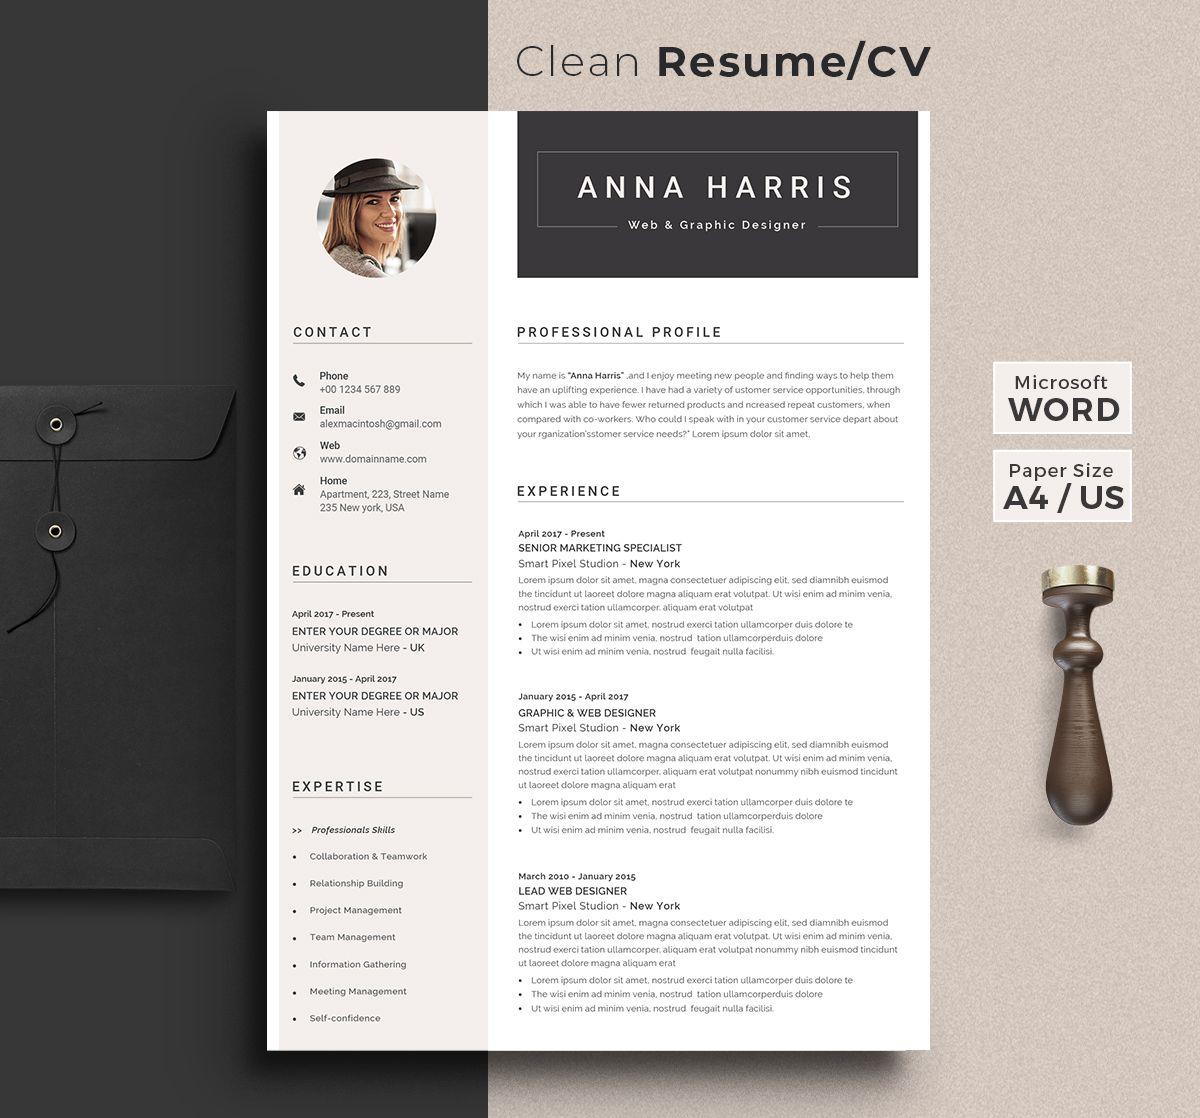 Resume Cv Template Resume Template Word Resume Template Professional Cv Template